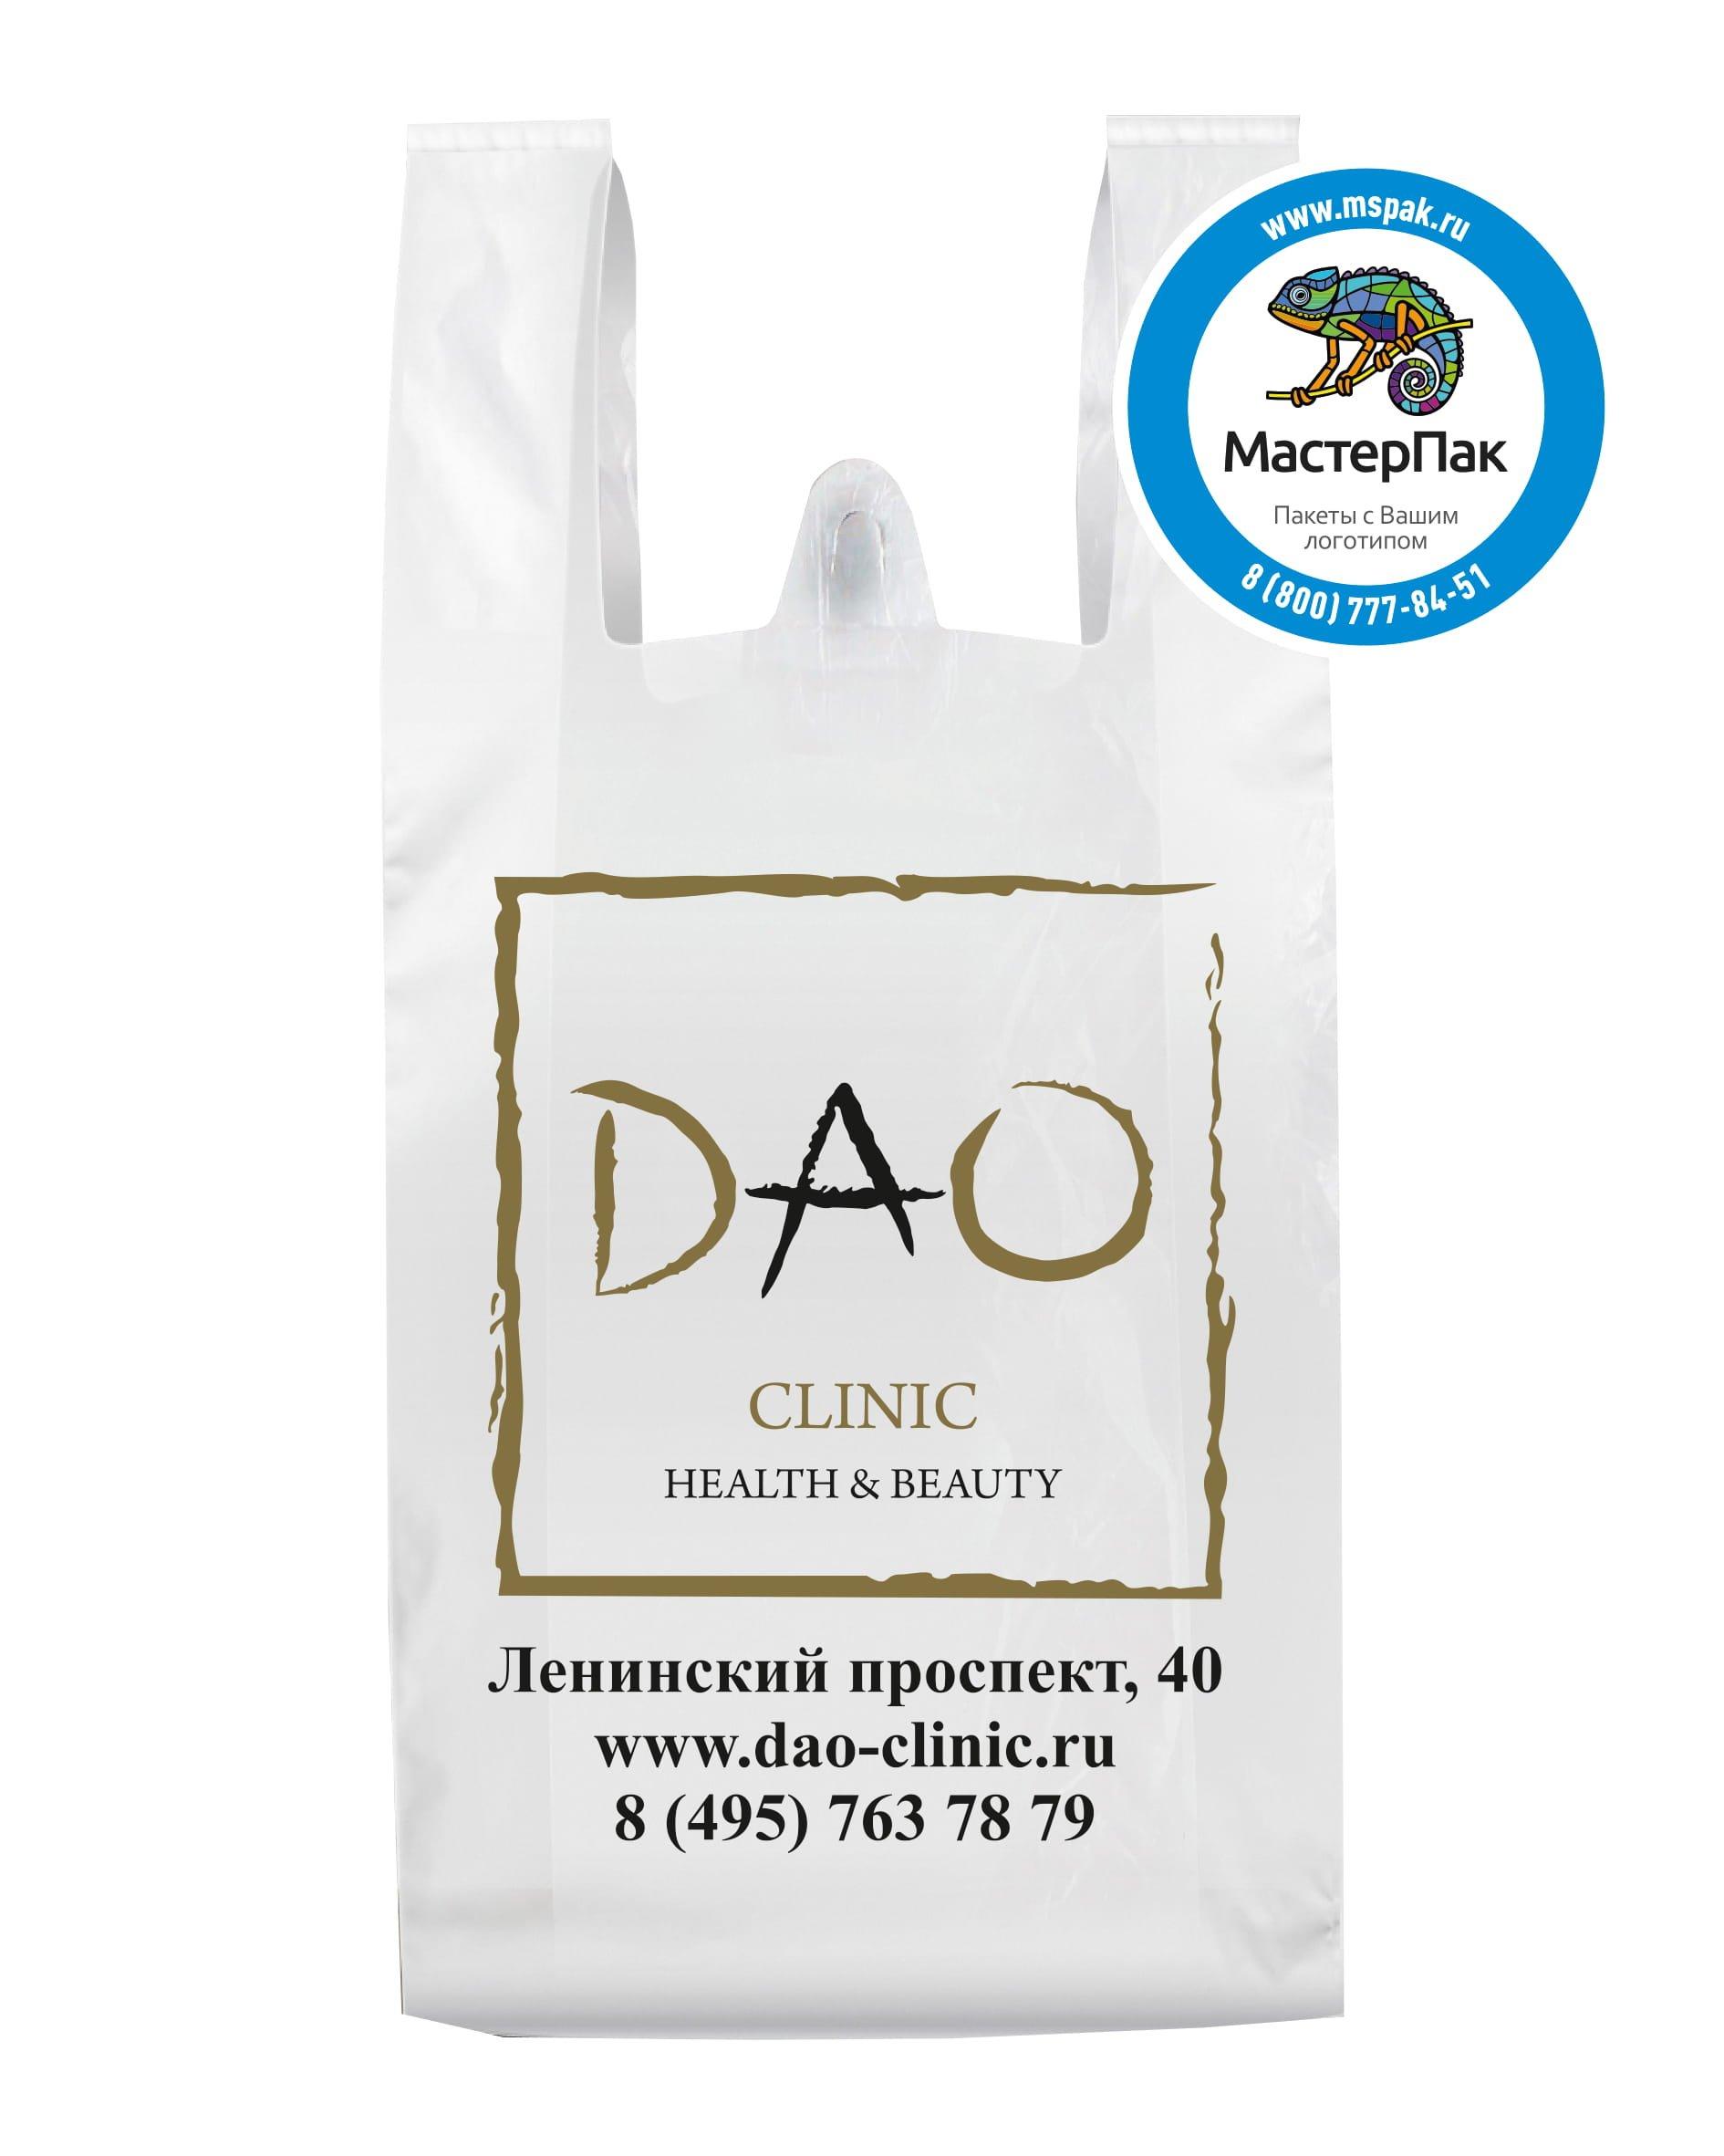 Пакет-майка с логотипом клиники DAO, Москва